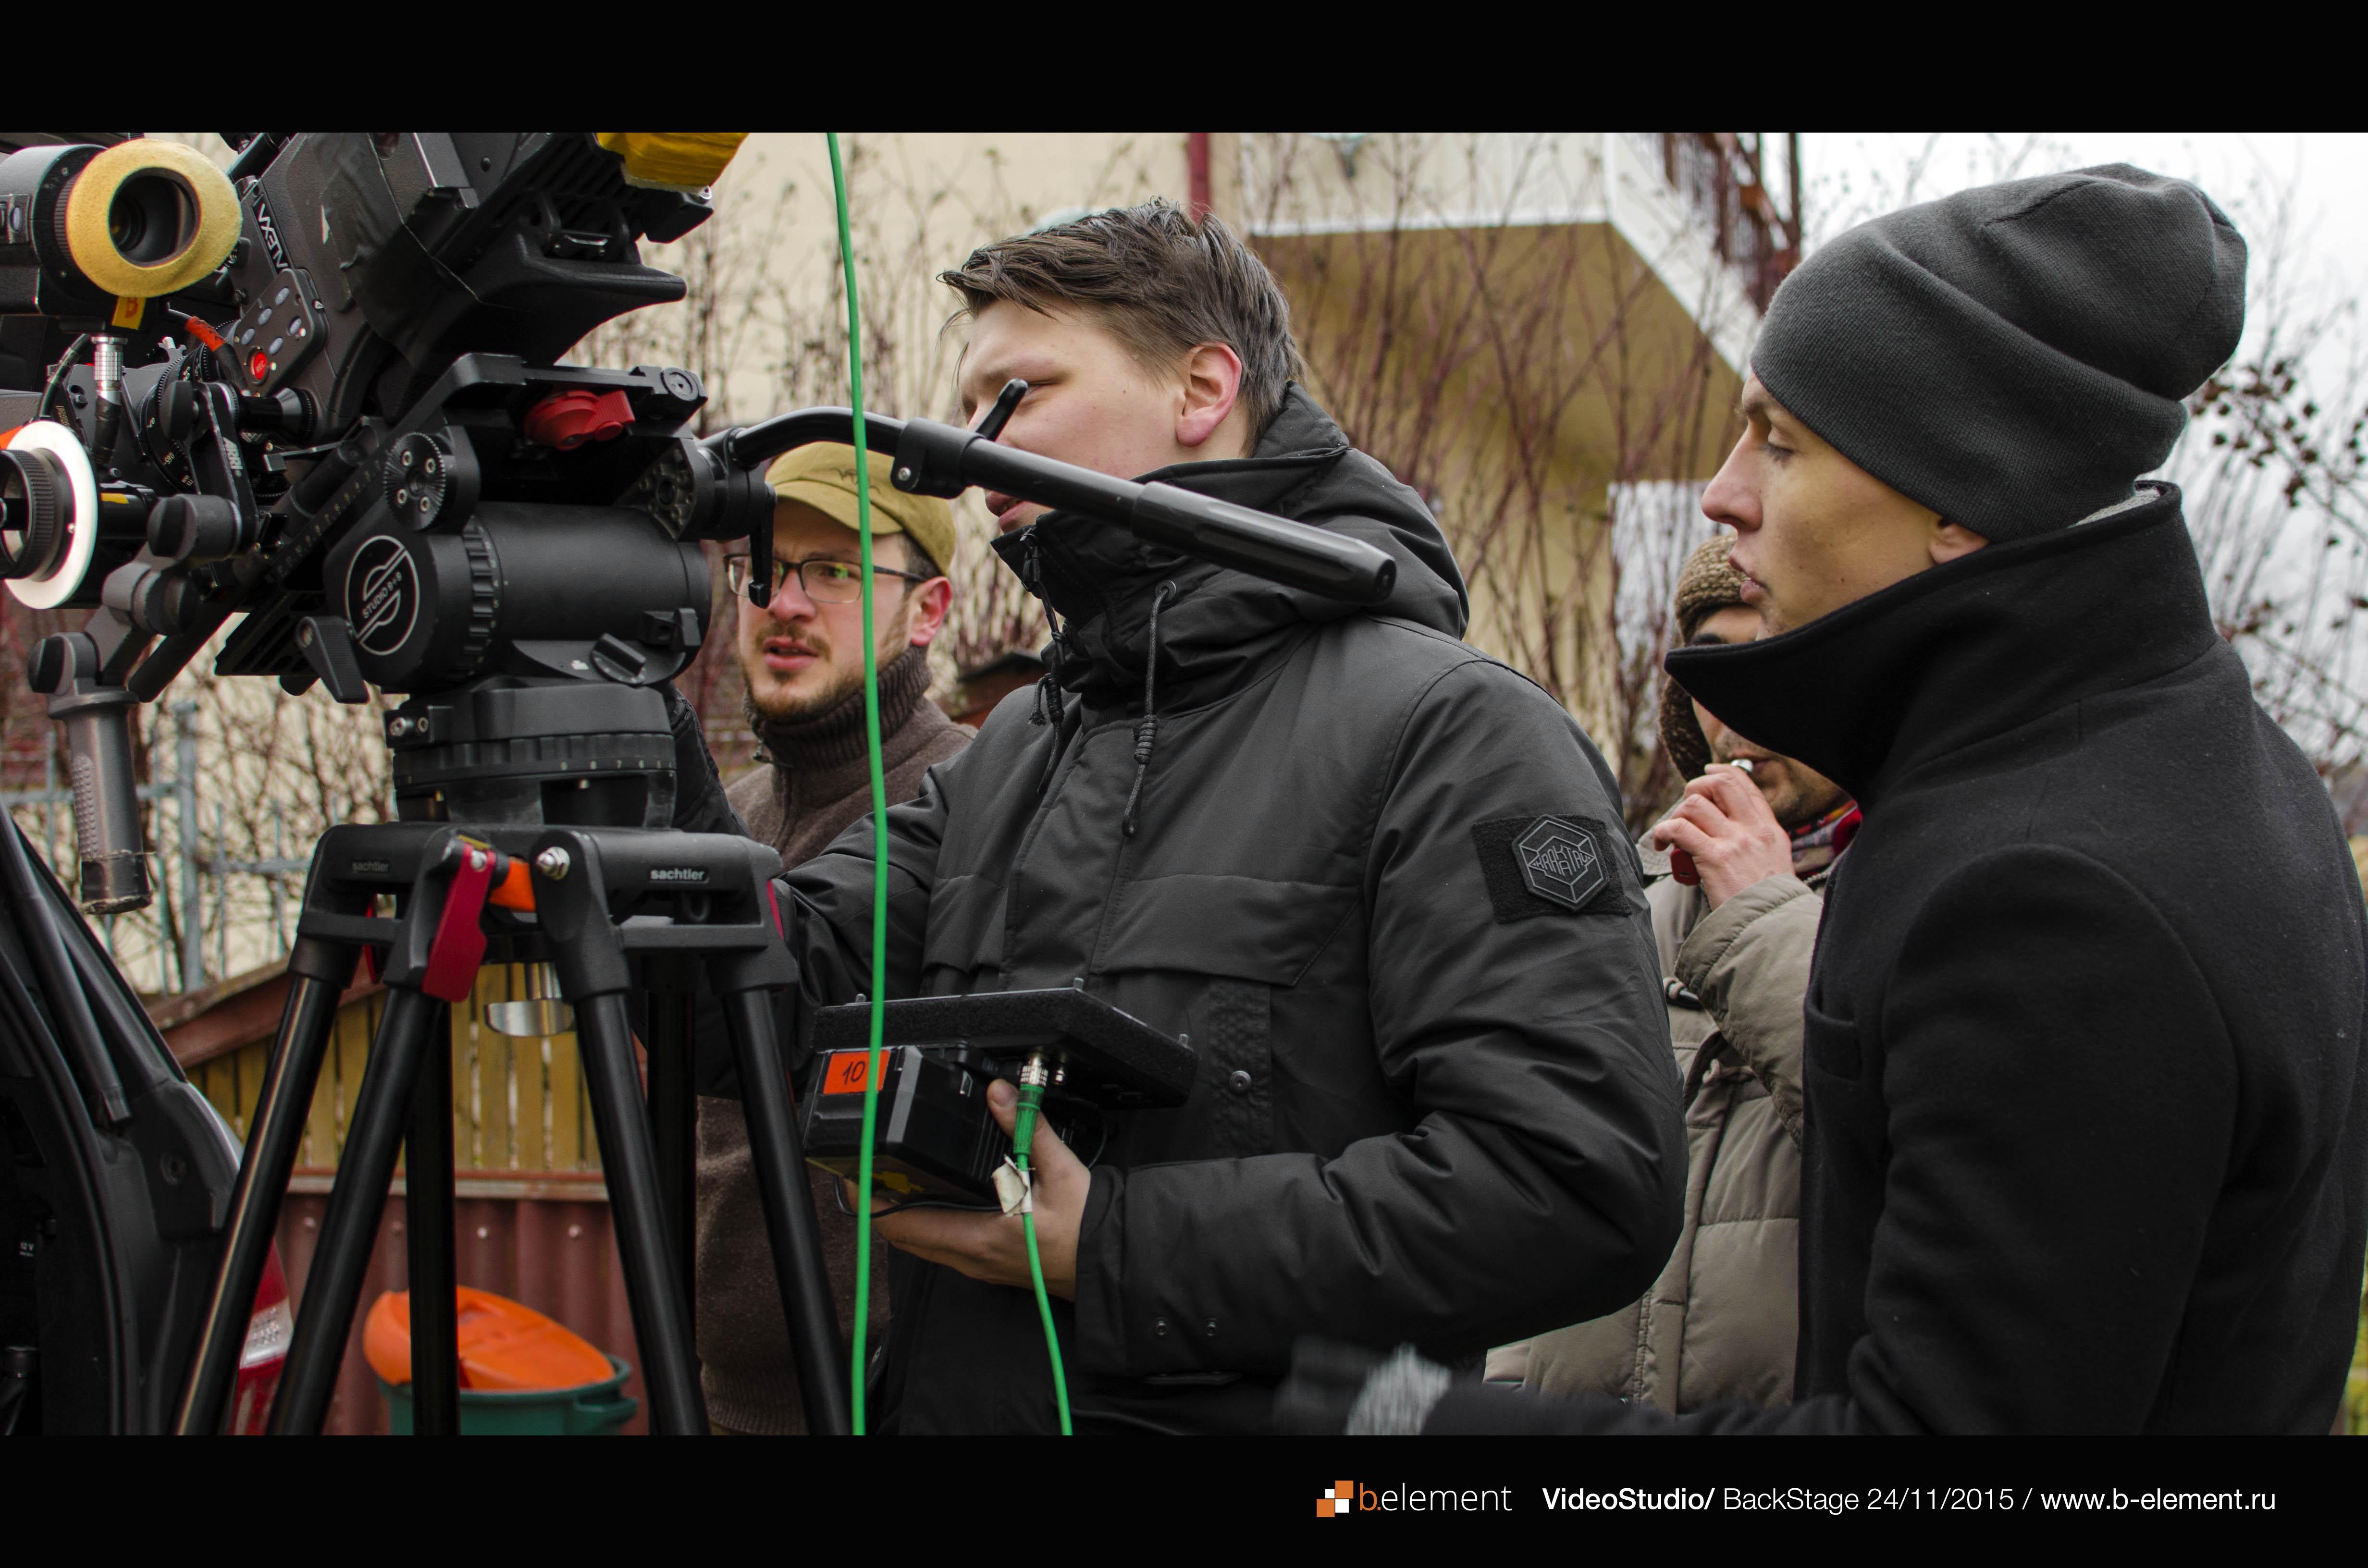 BackStage: Видеопрезентация «Мобильного очага», 24.11.2015